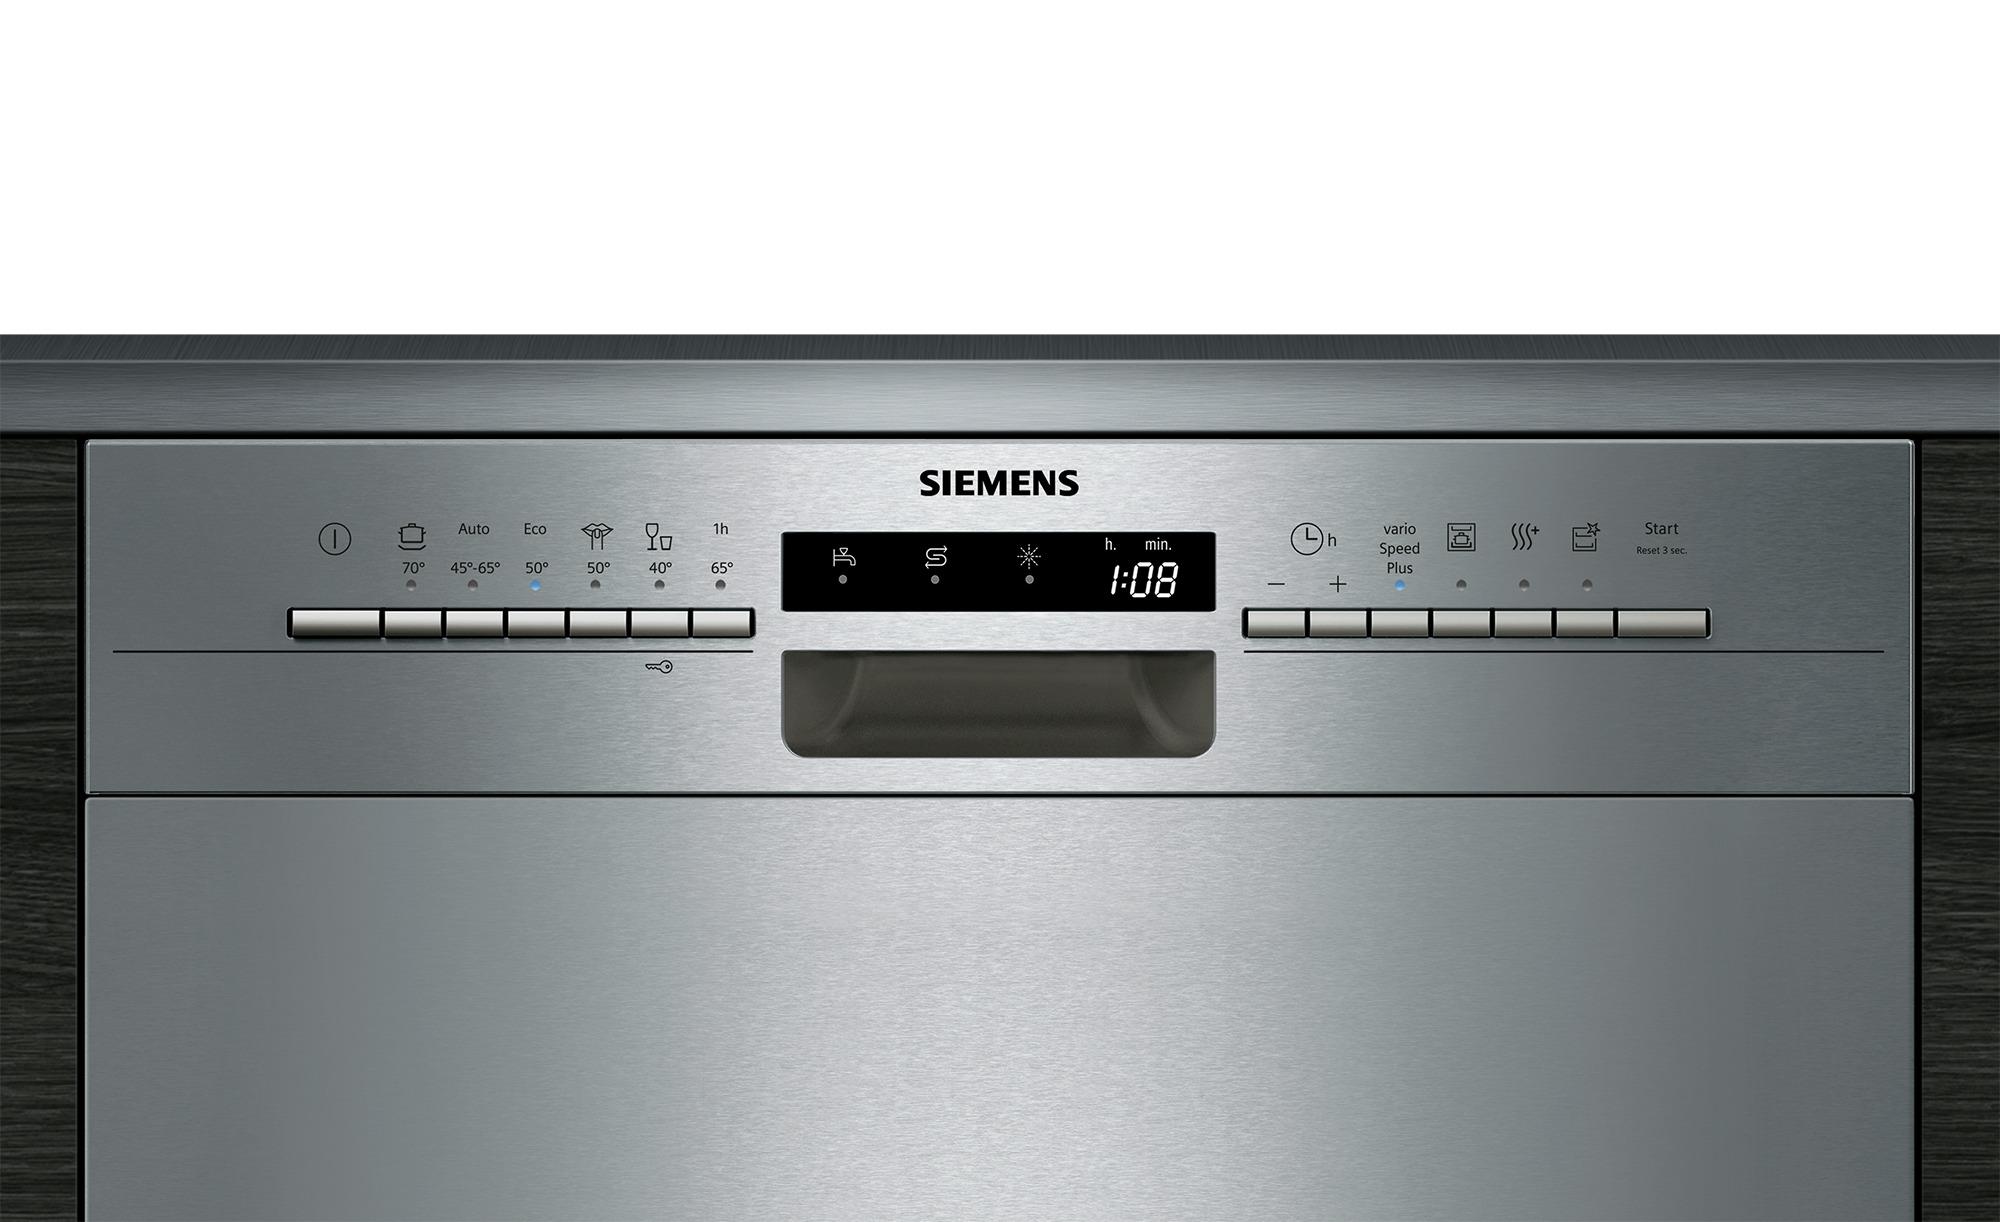 Siemens unterbau geschirrspüler sn 436 s01 ce möbel kraft